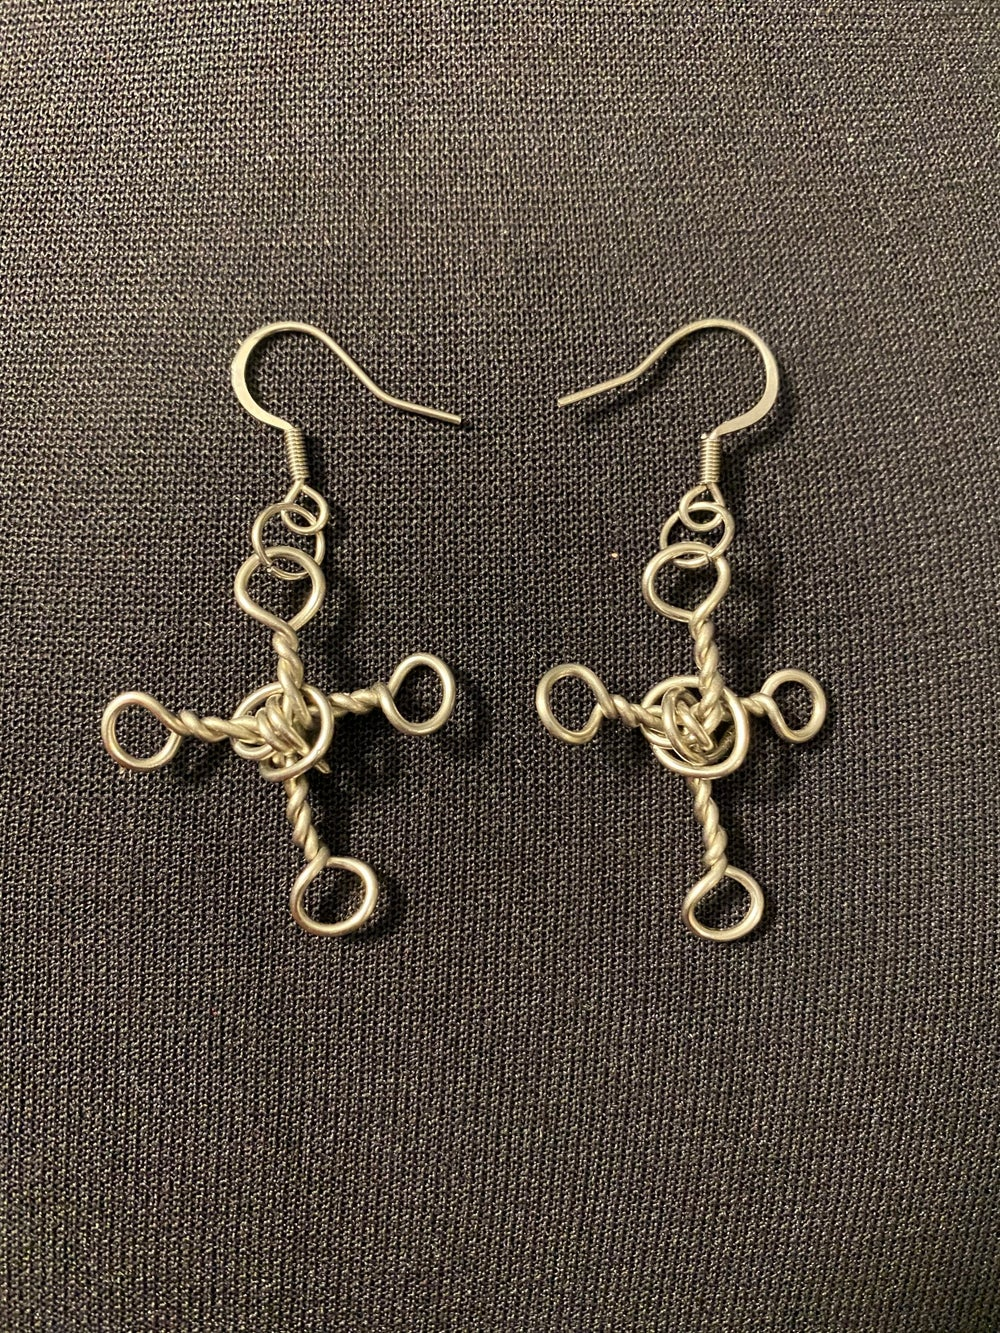 Stainless Steel Cross Earrings